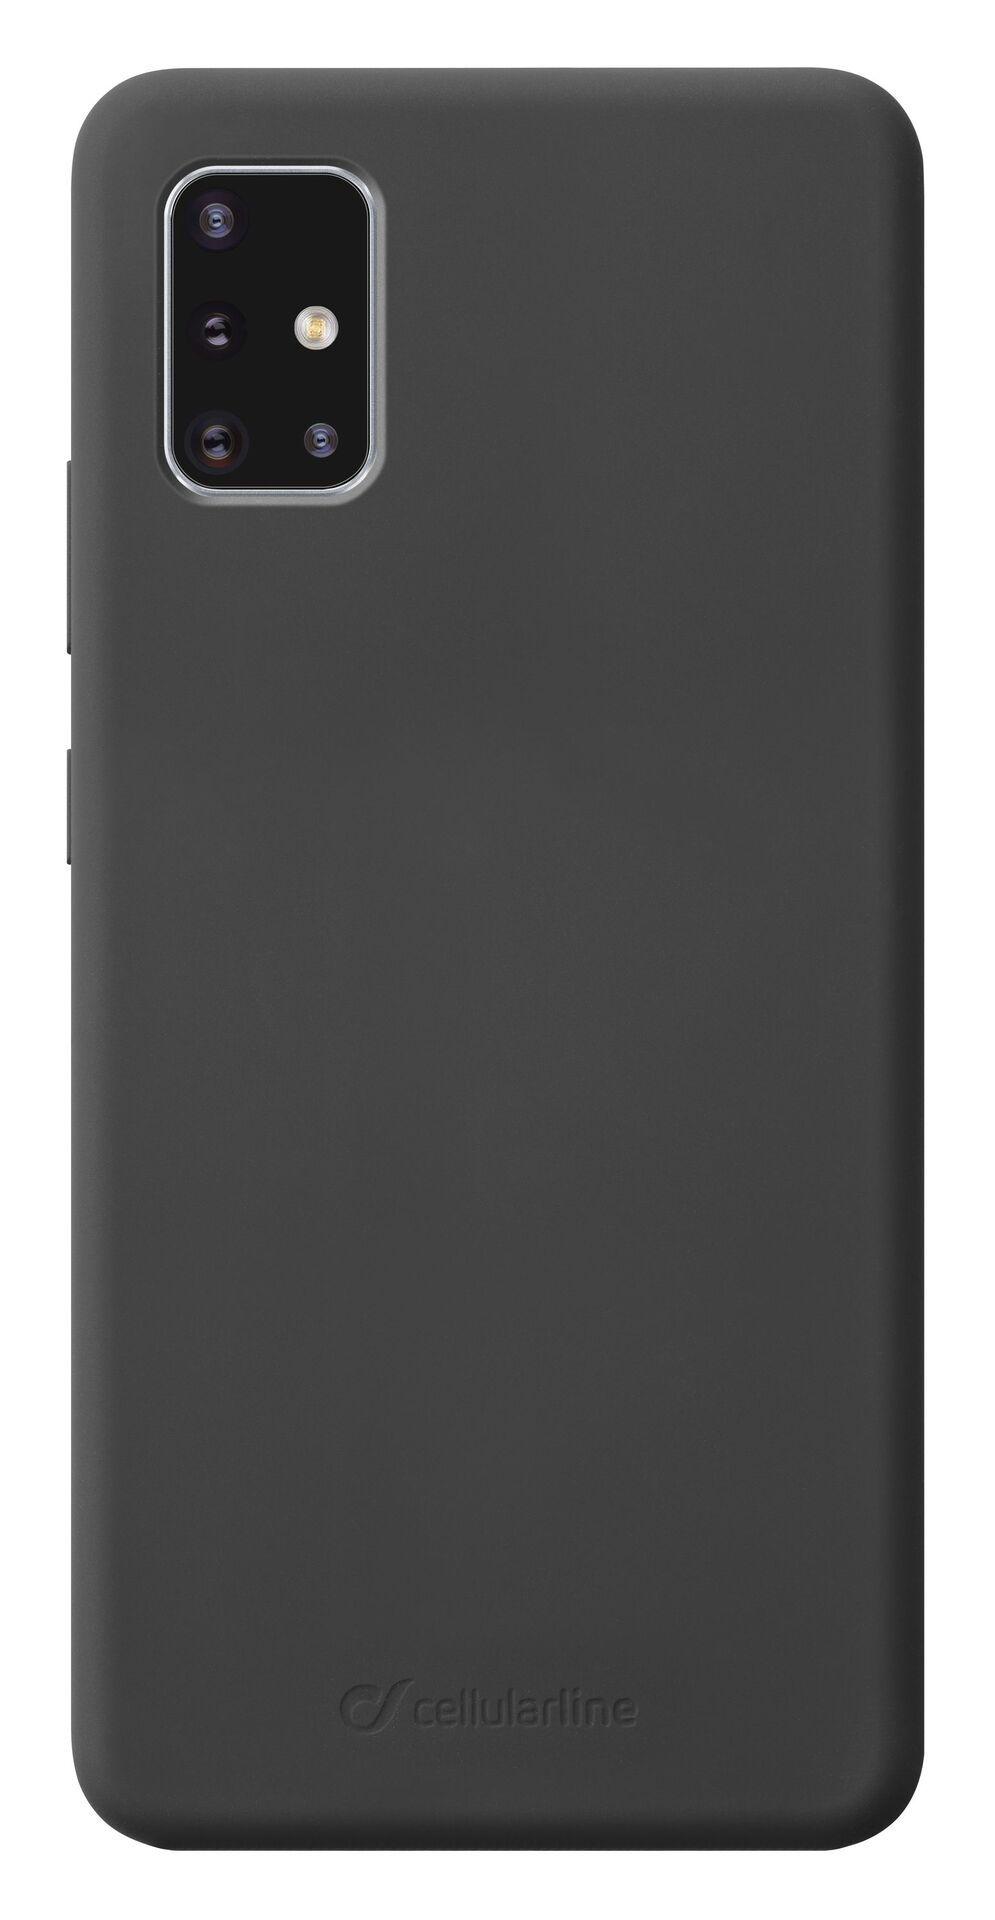 Калъф за Samsung Galaxy A51 Cellularline - Sensation, черен - 1